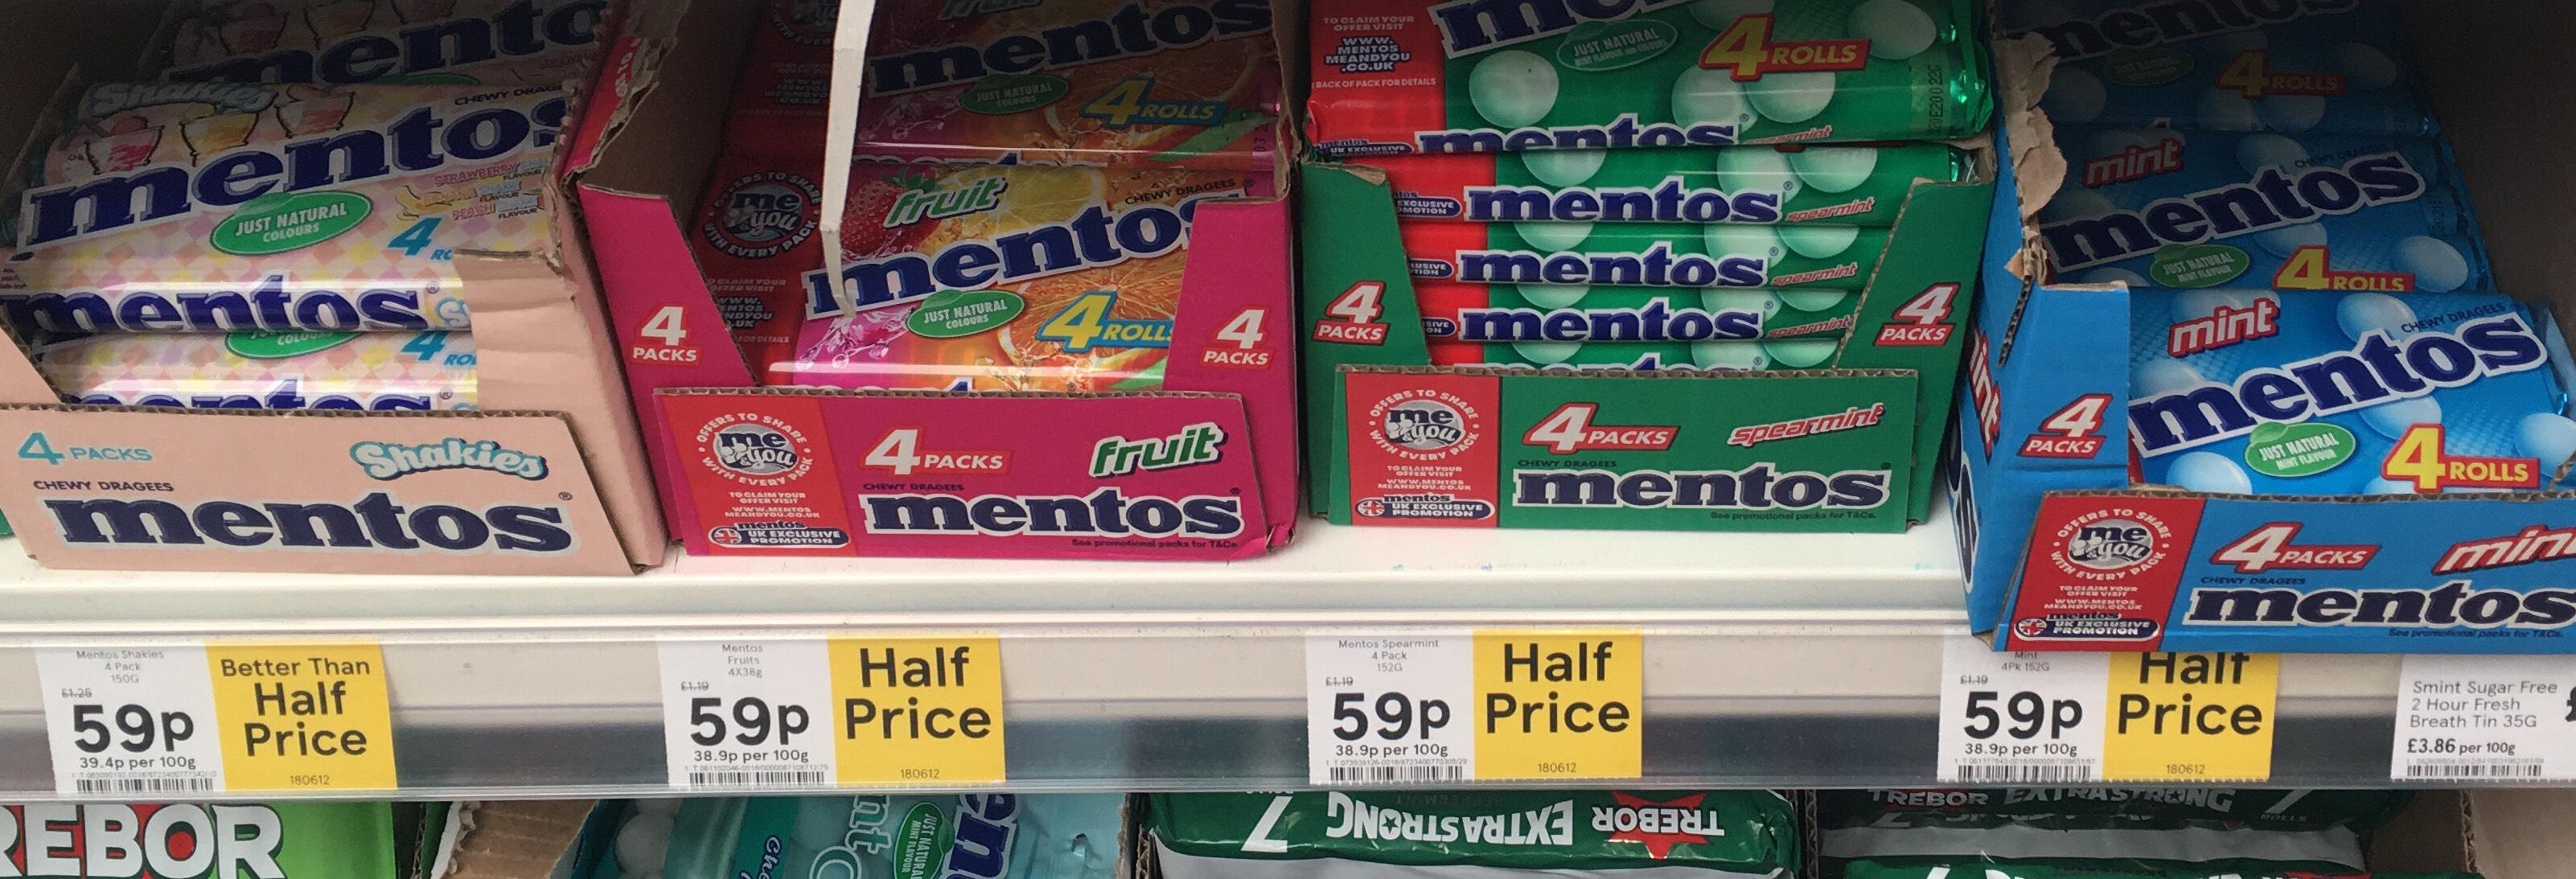 Mentos 4 pack - 59p instore @ Tesco Crewe